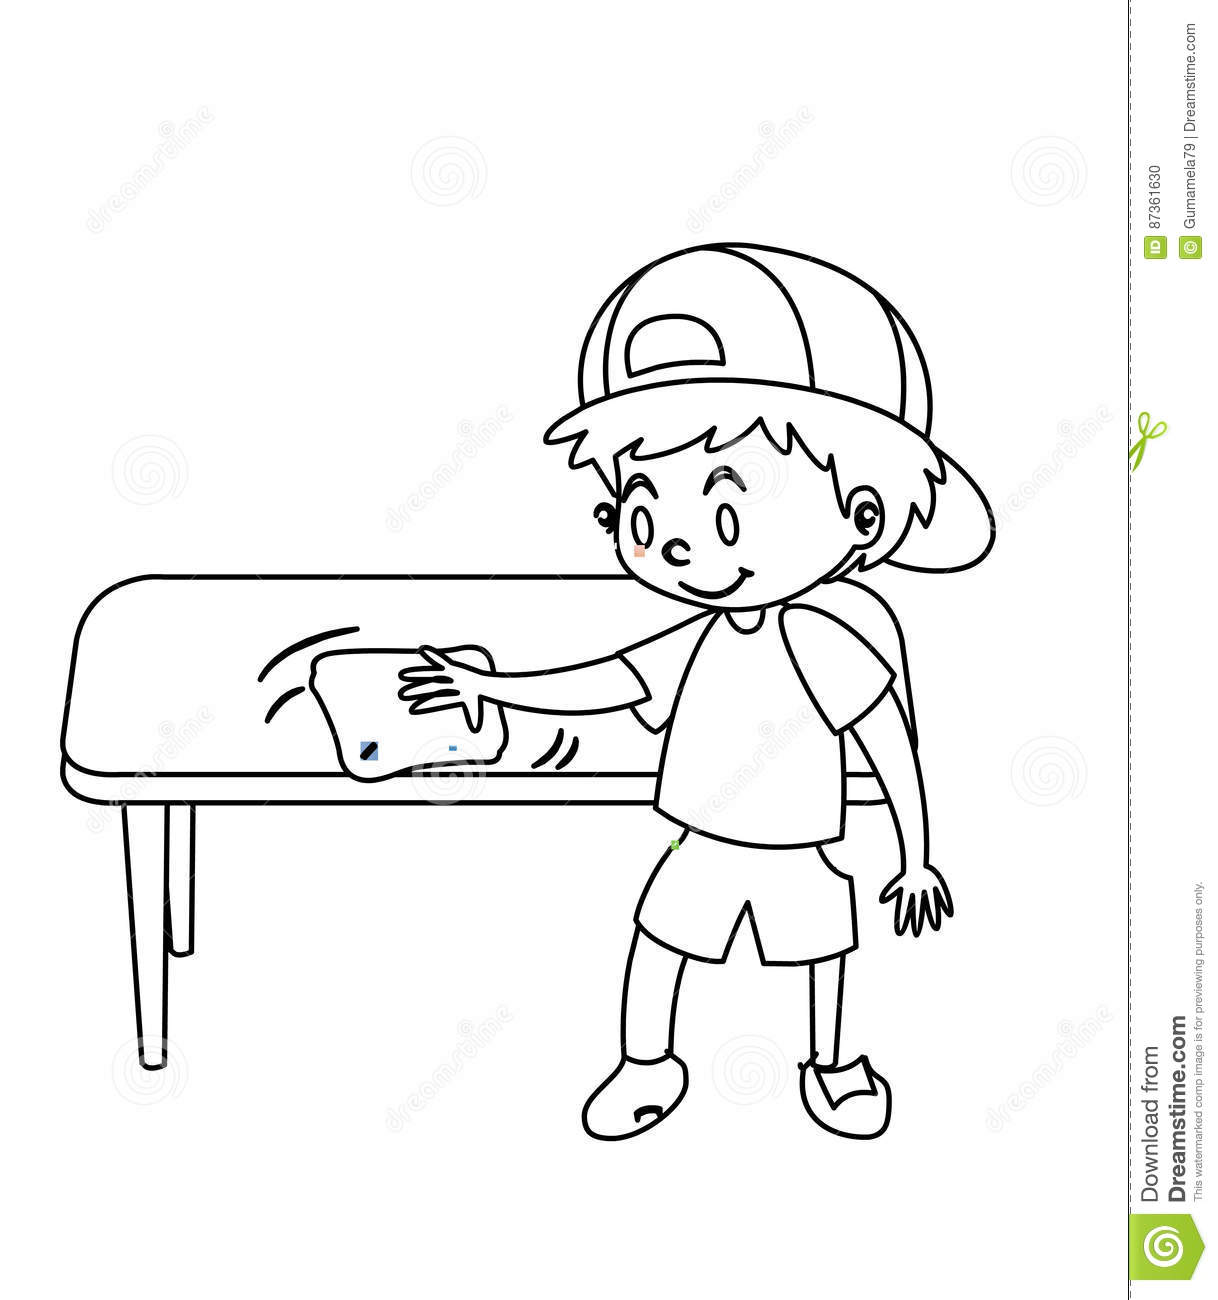 Little Einsteins Drawing At Getdrawings